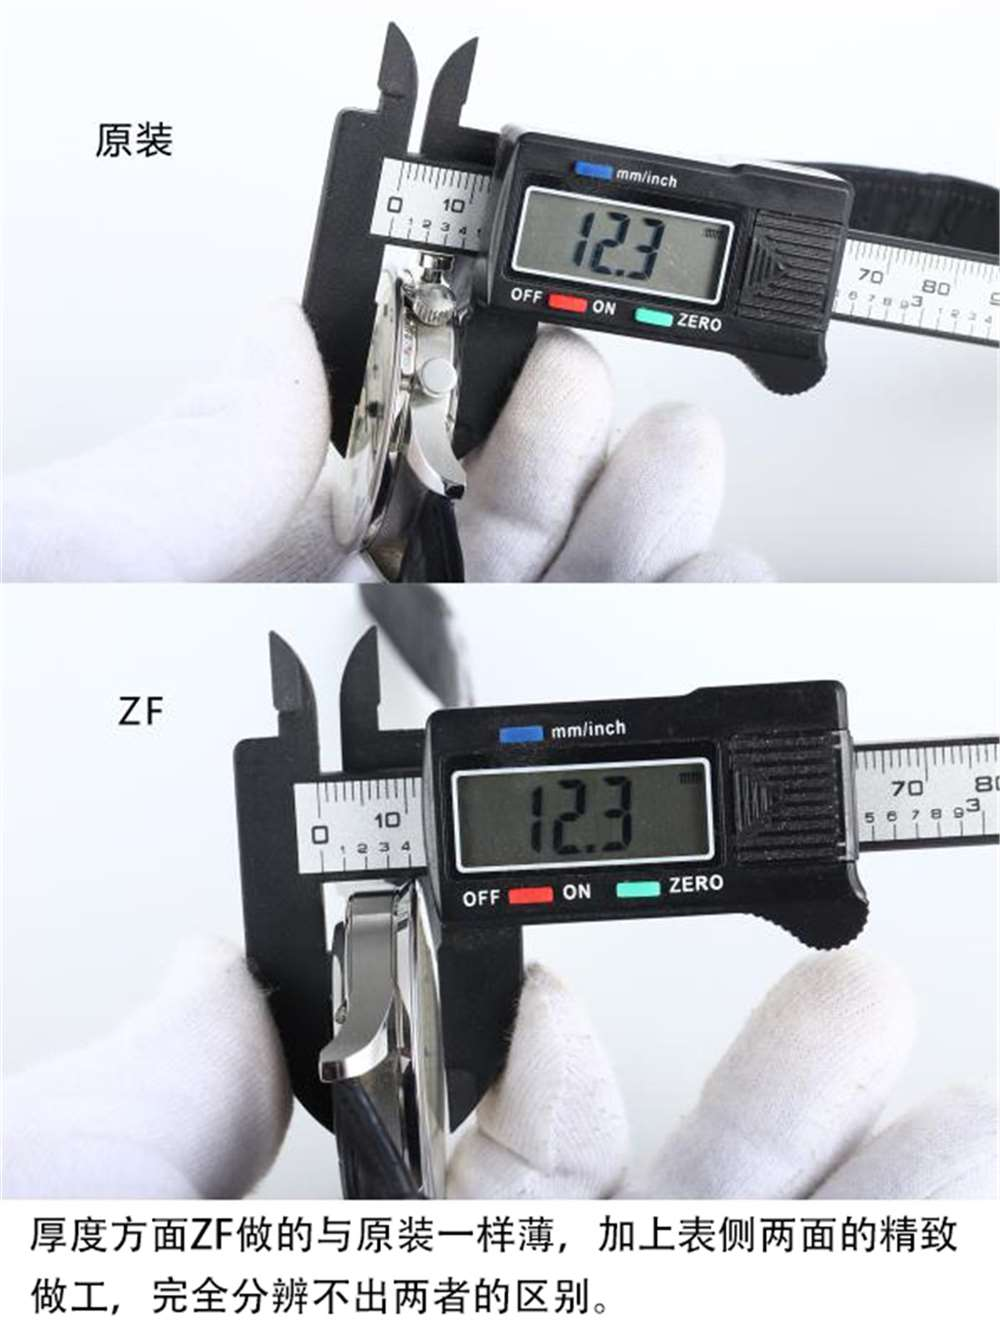 ZF厂万国葡计IW371446蓝针V2升级版对比正品评测